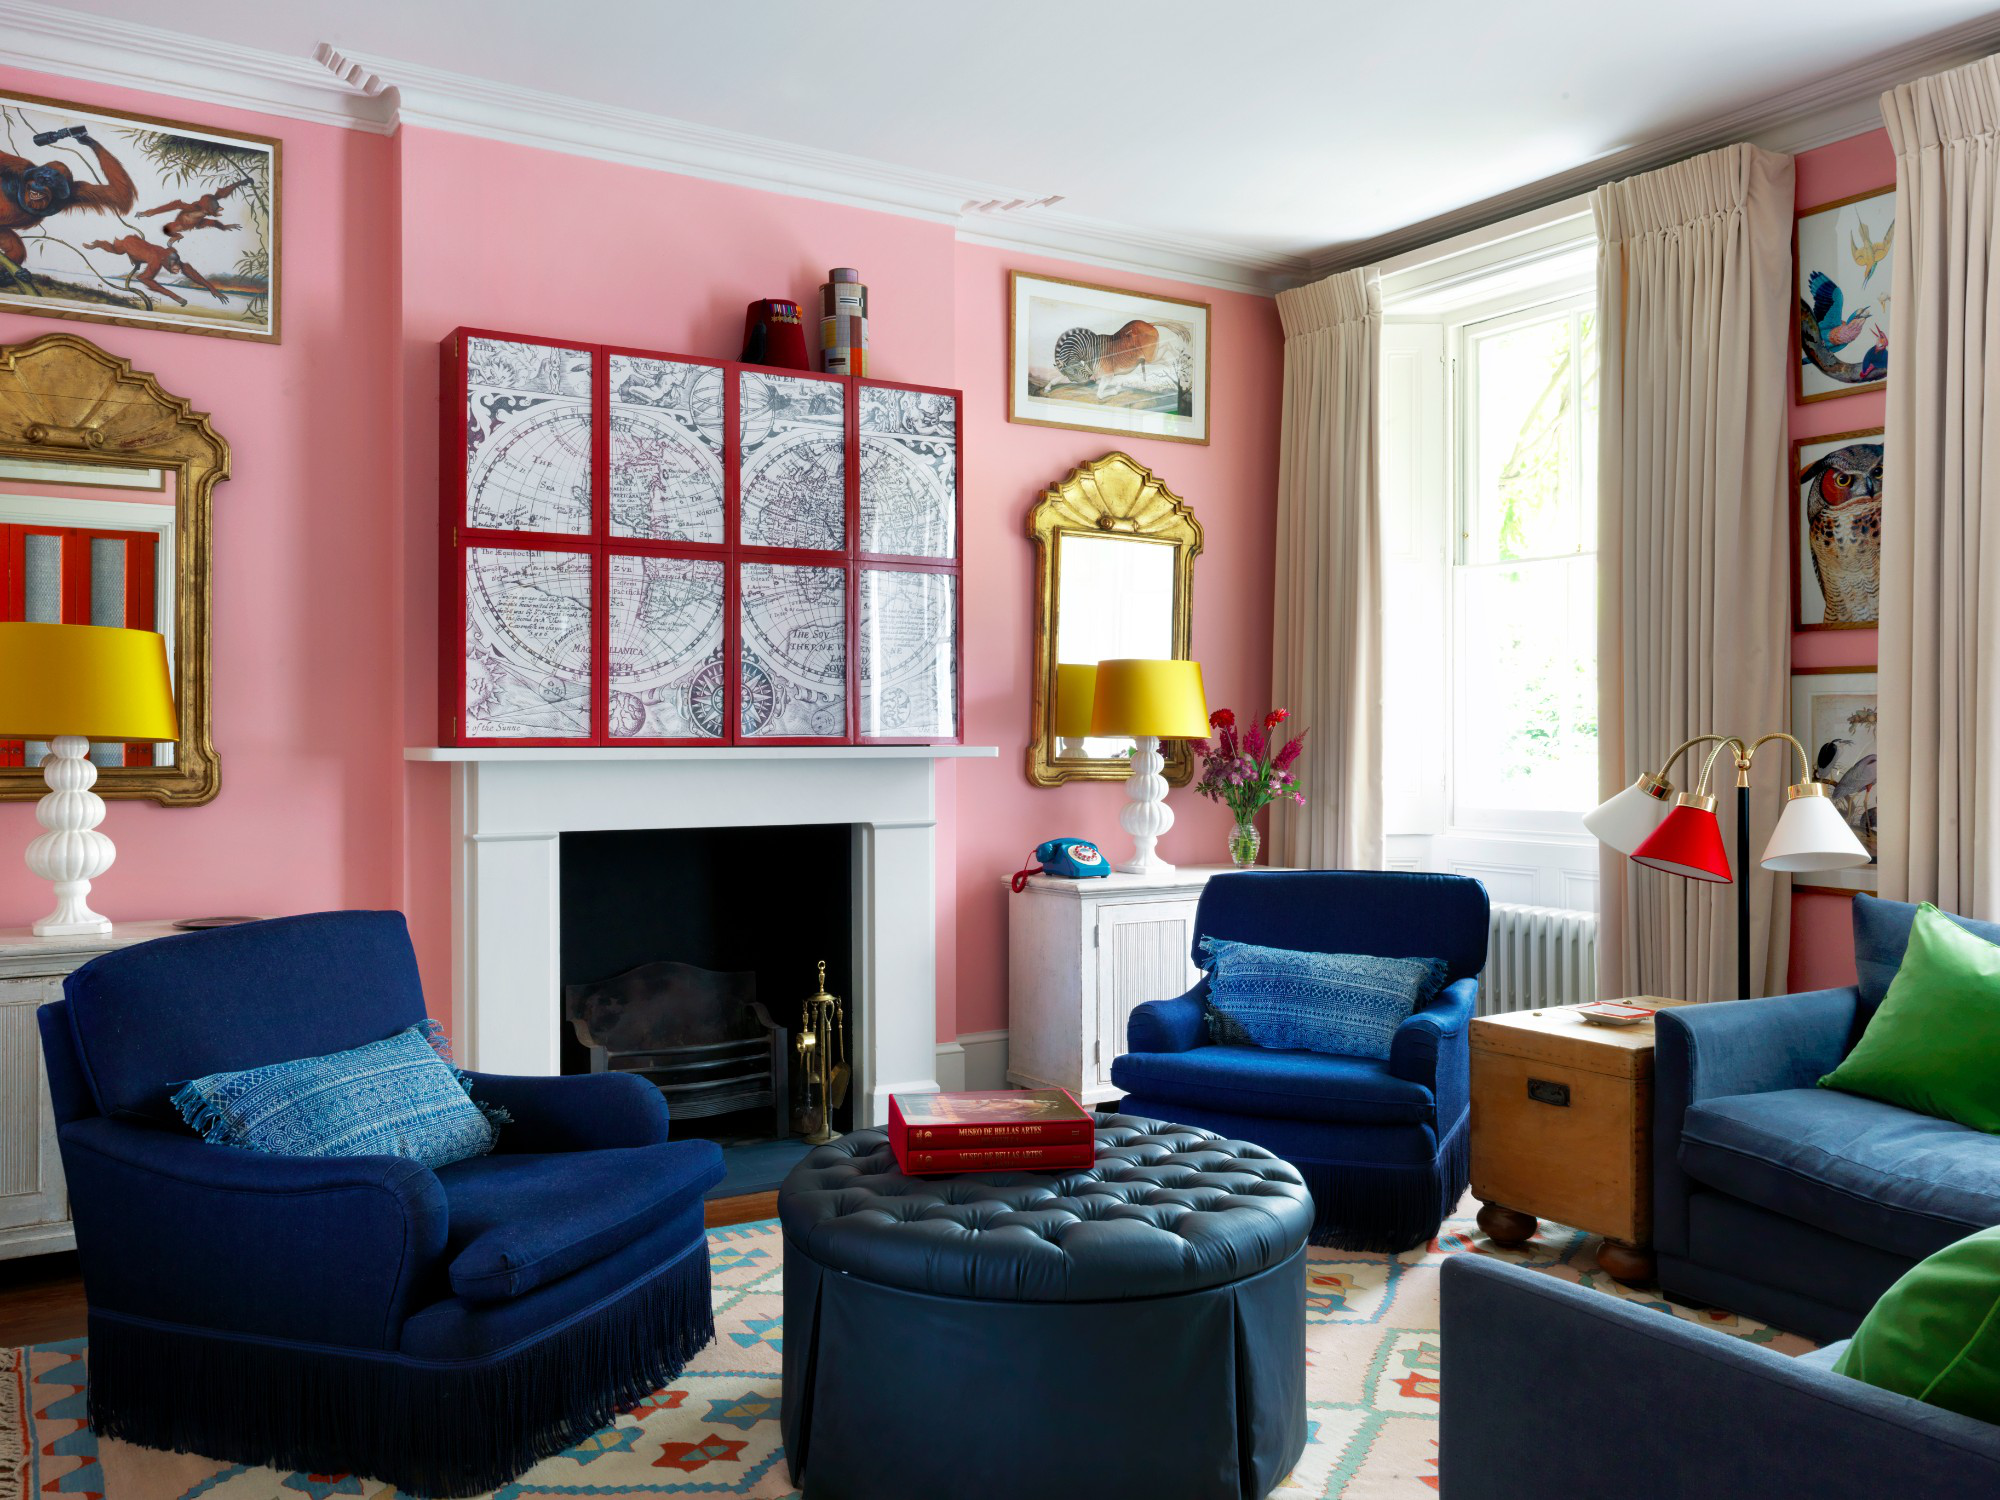 West London House, Living Room by Beata Heuman Ltd.